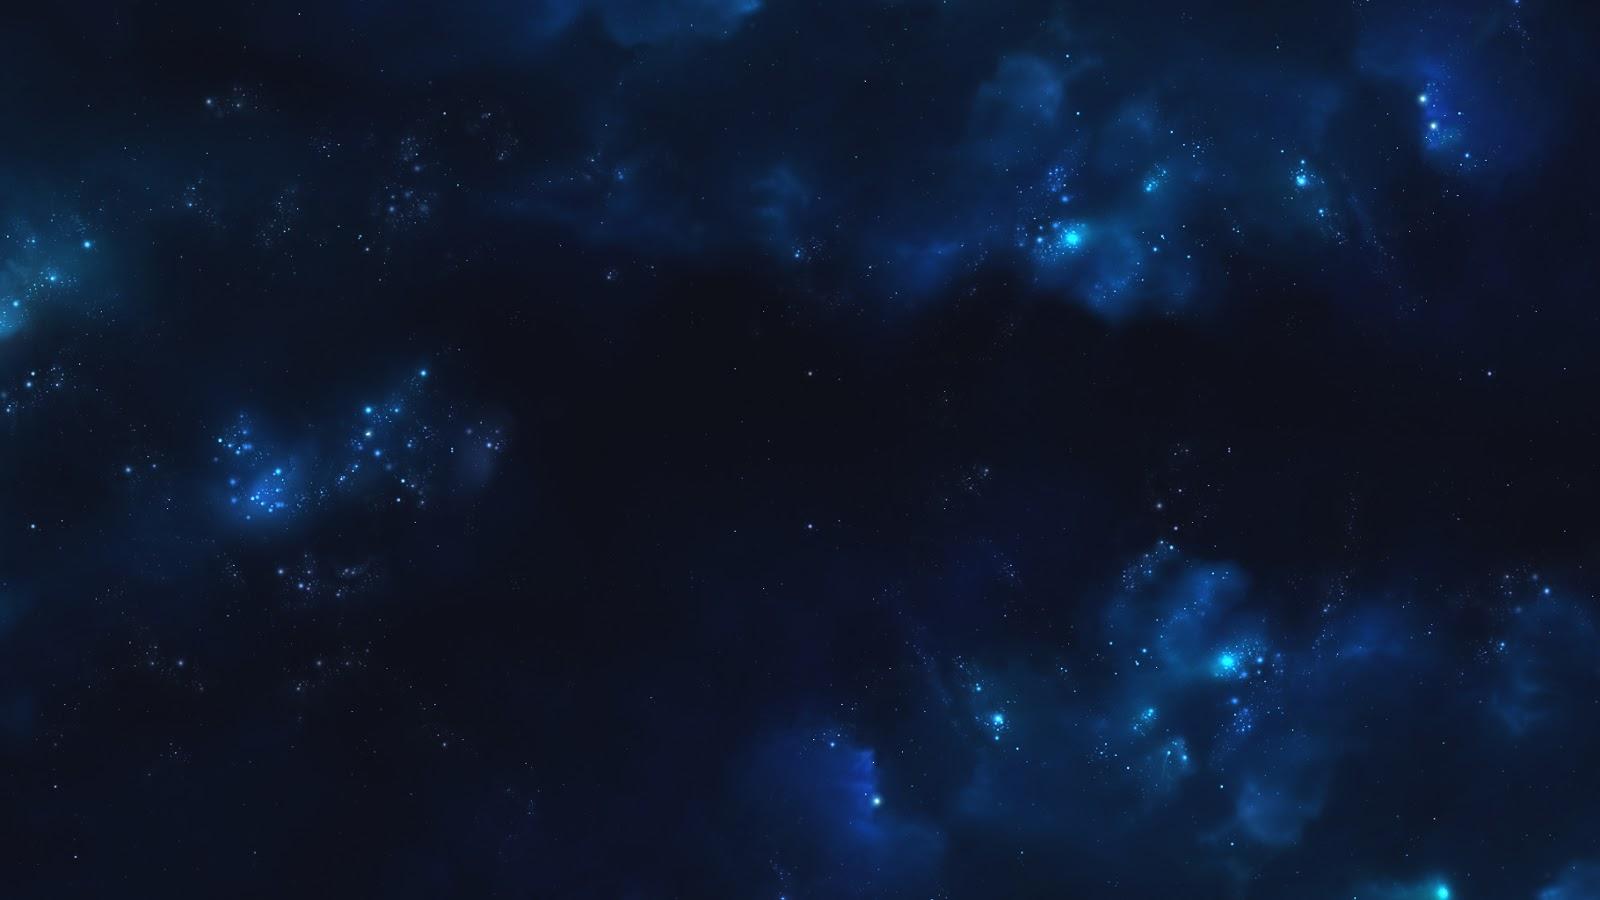 spacefantasy wallpaper set 62